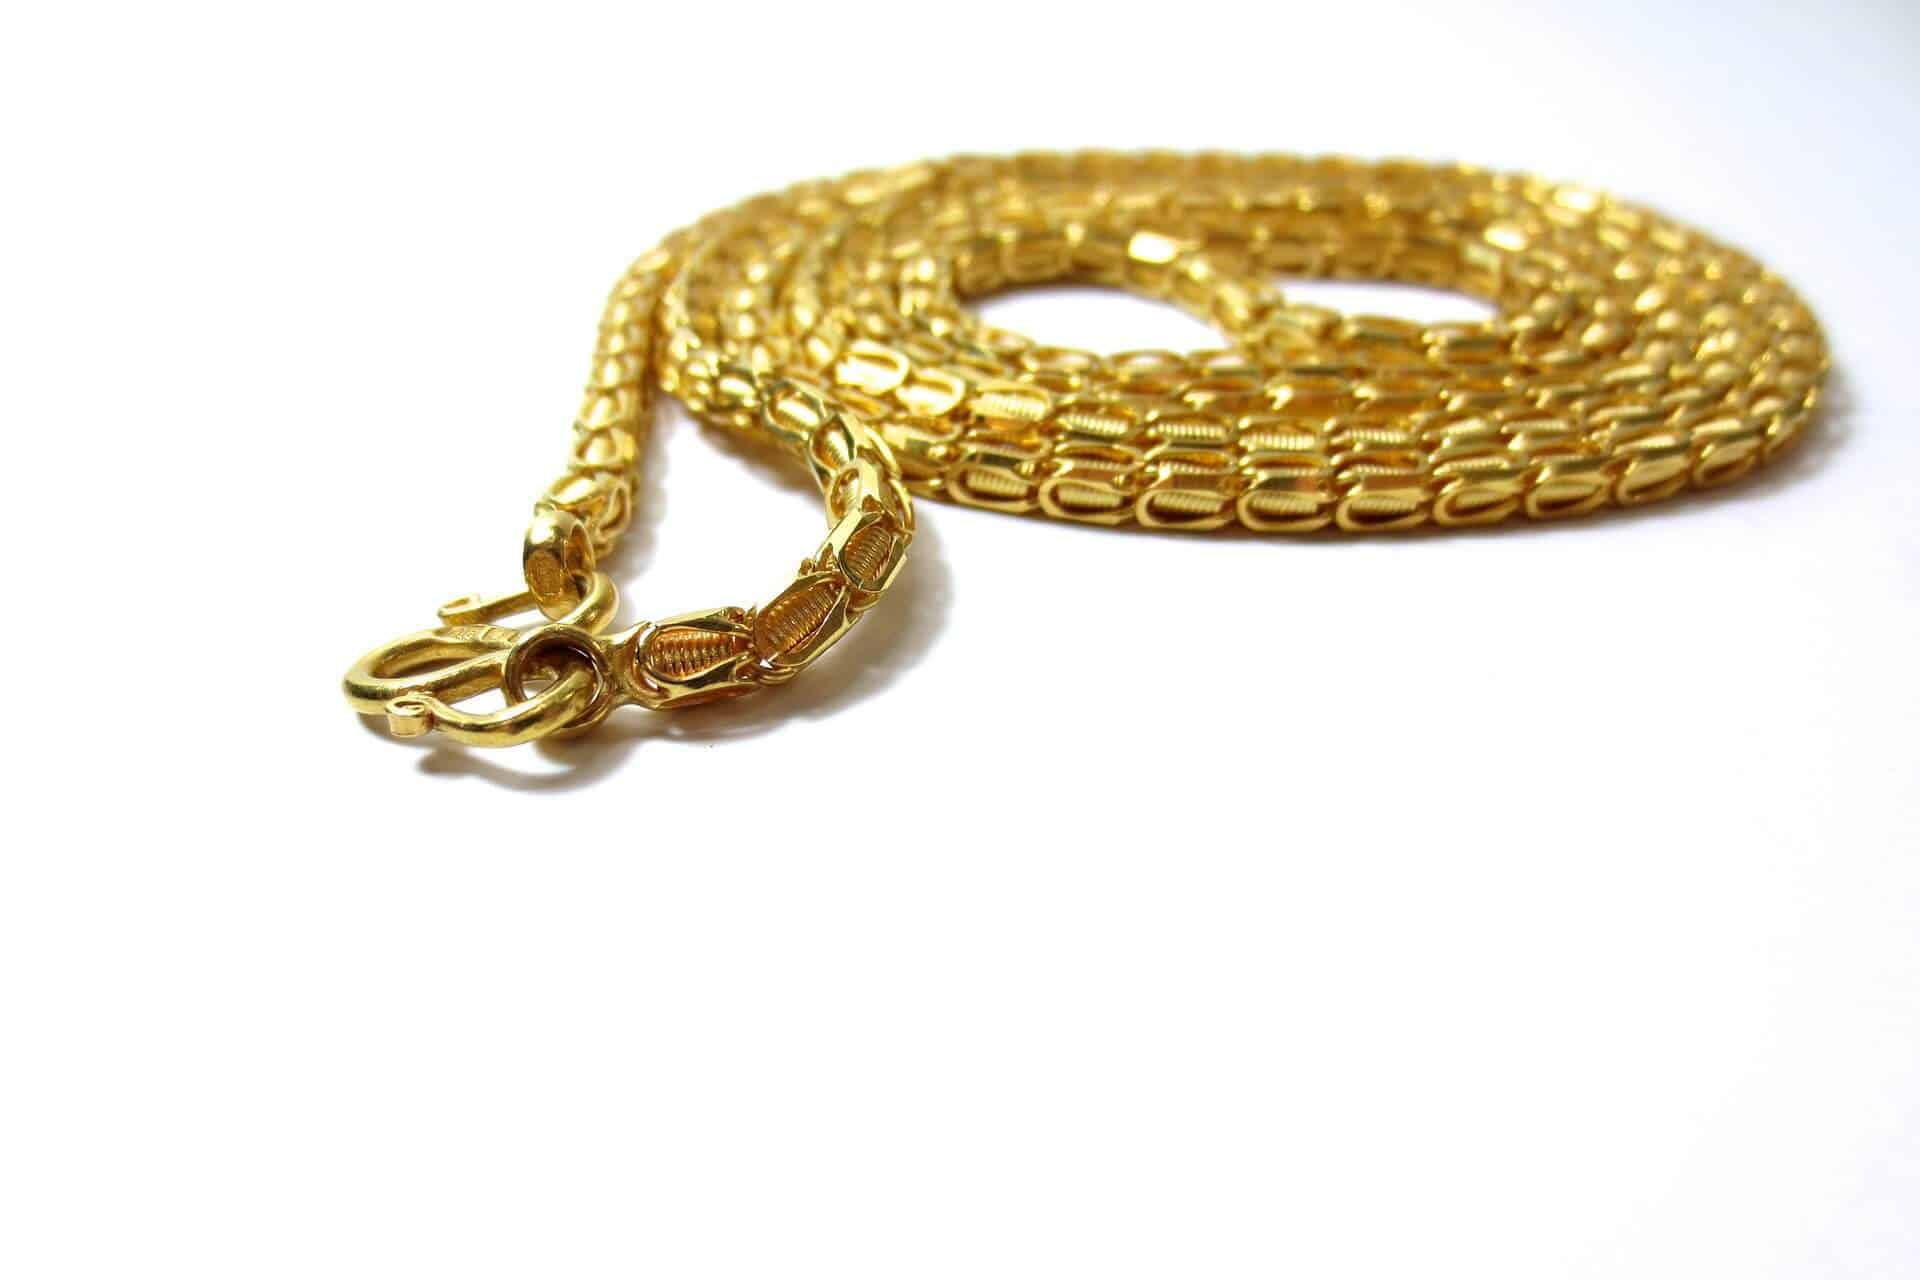 Top 13 Jewellery Brands UK – Jewelry Guide